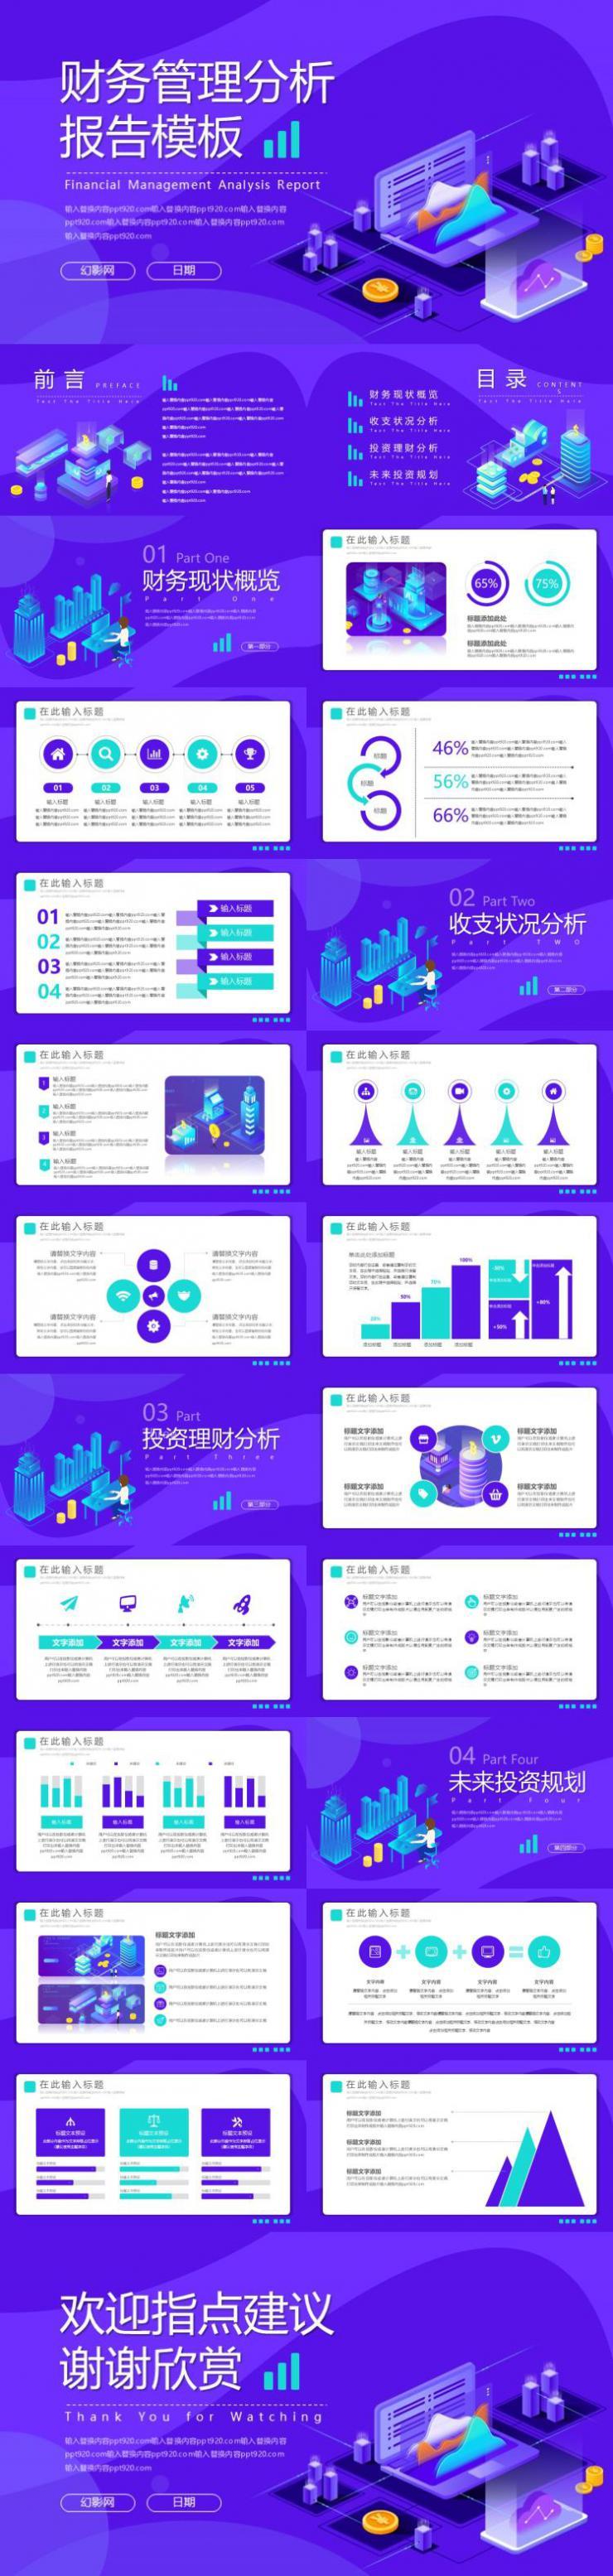 2.5d蓝色财务管理分析报告PPT模板